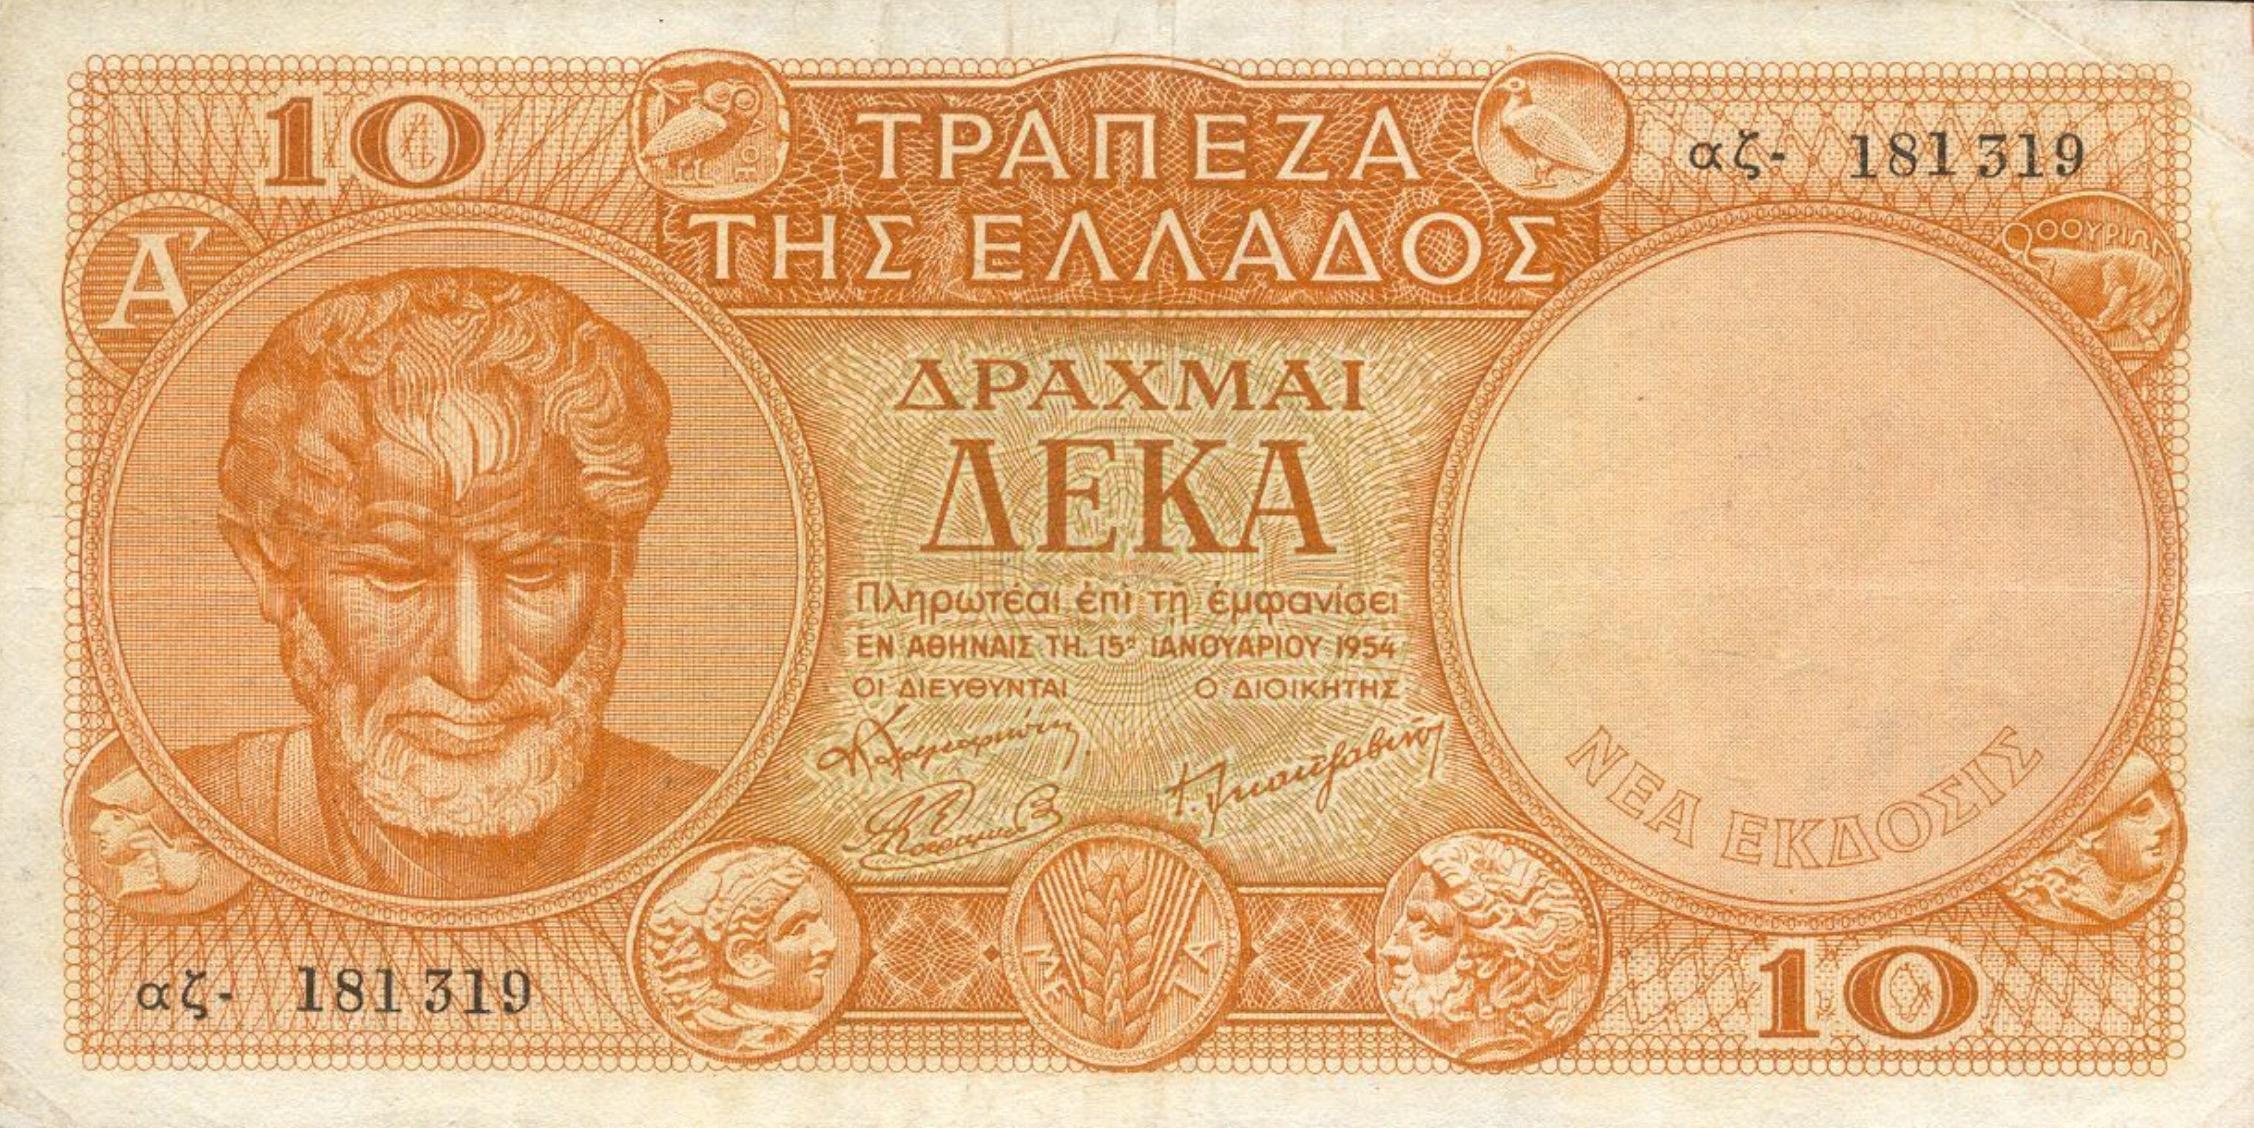 10 Greek Drachmas banknote (Aristotle)